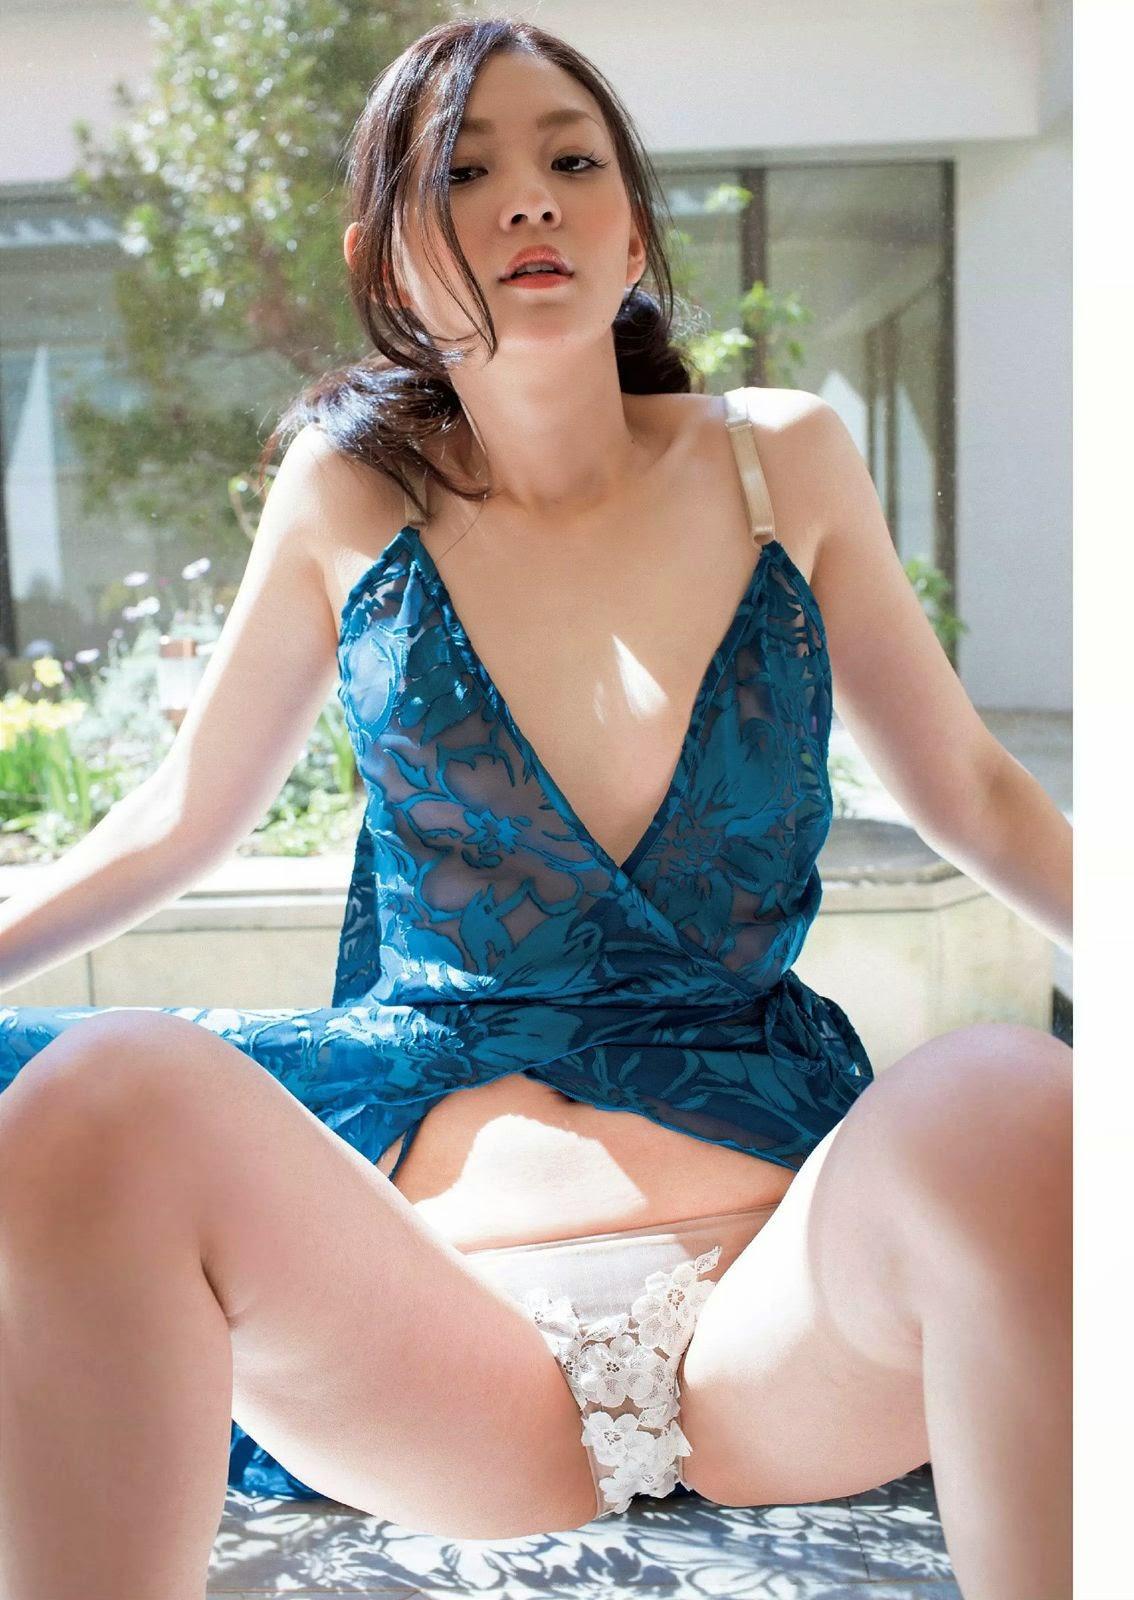 Hosoya Rena 細谷レナ Weekly Playboy 週刊プレイボーイ No 18 2015 Images 4